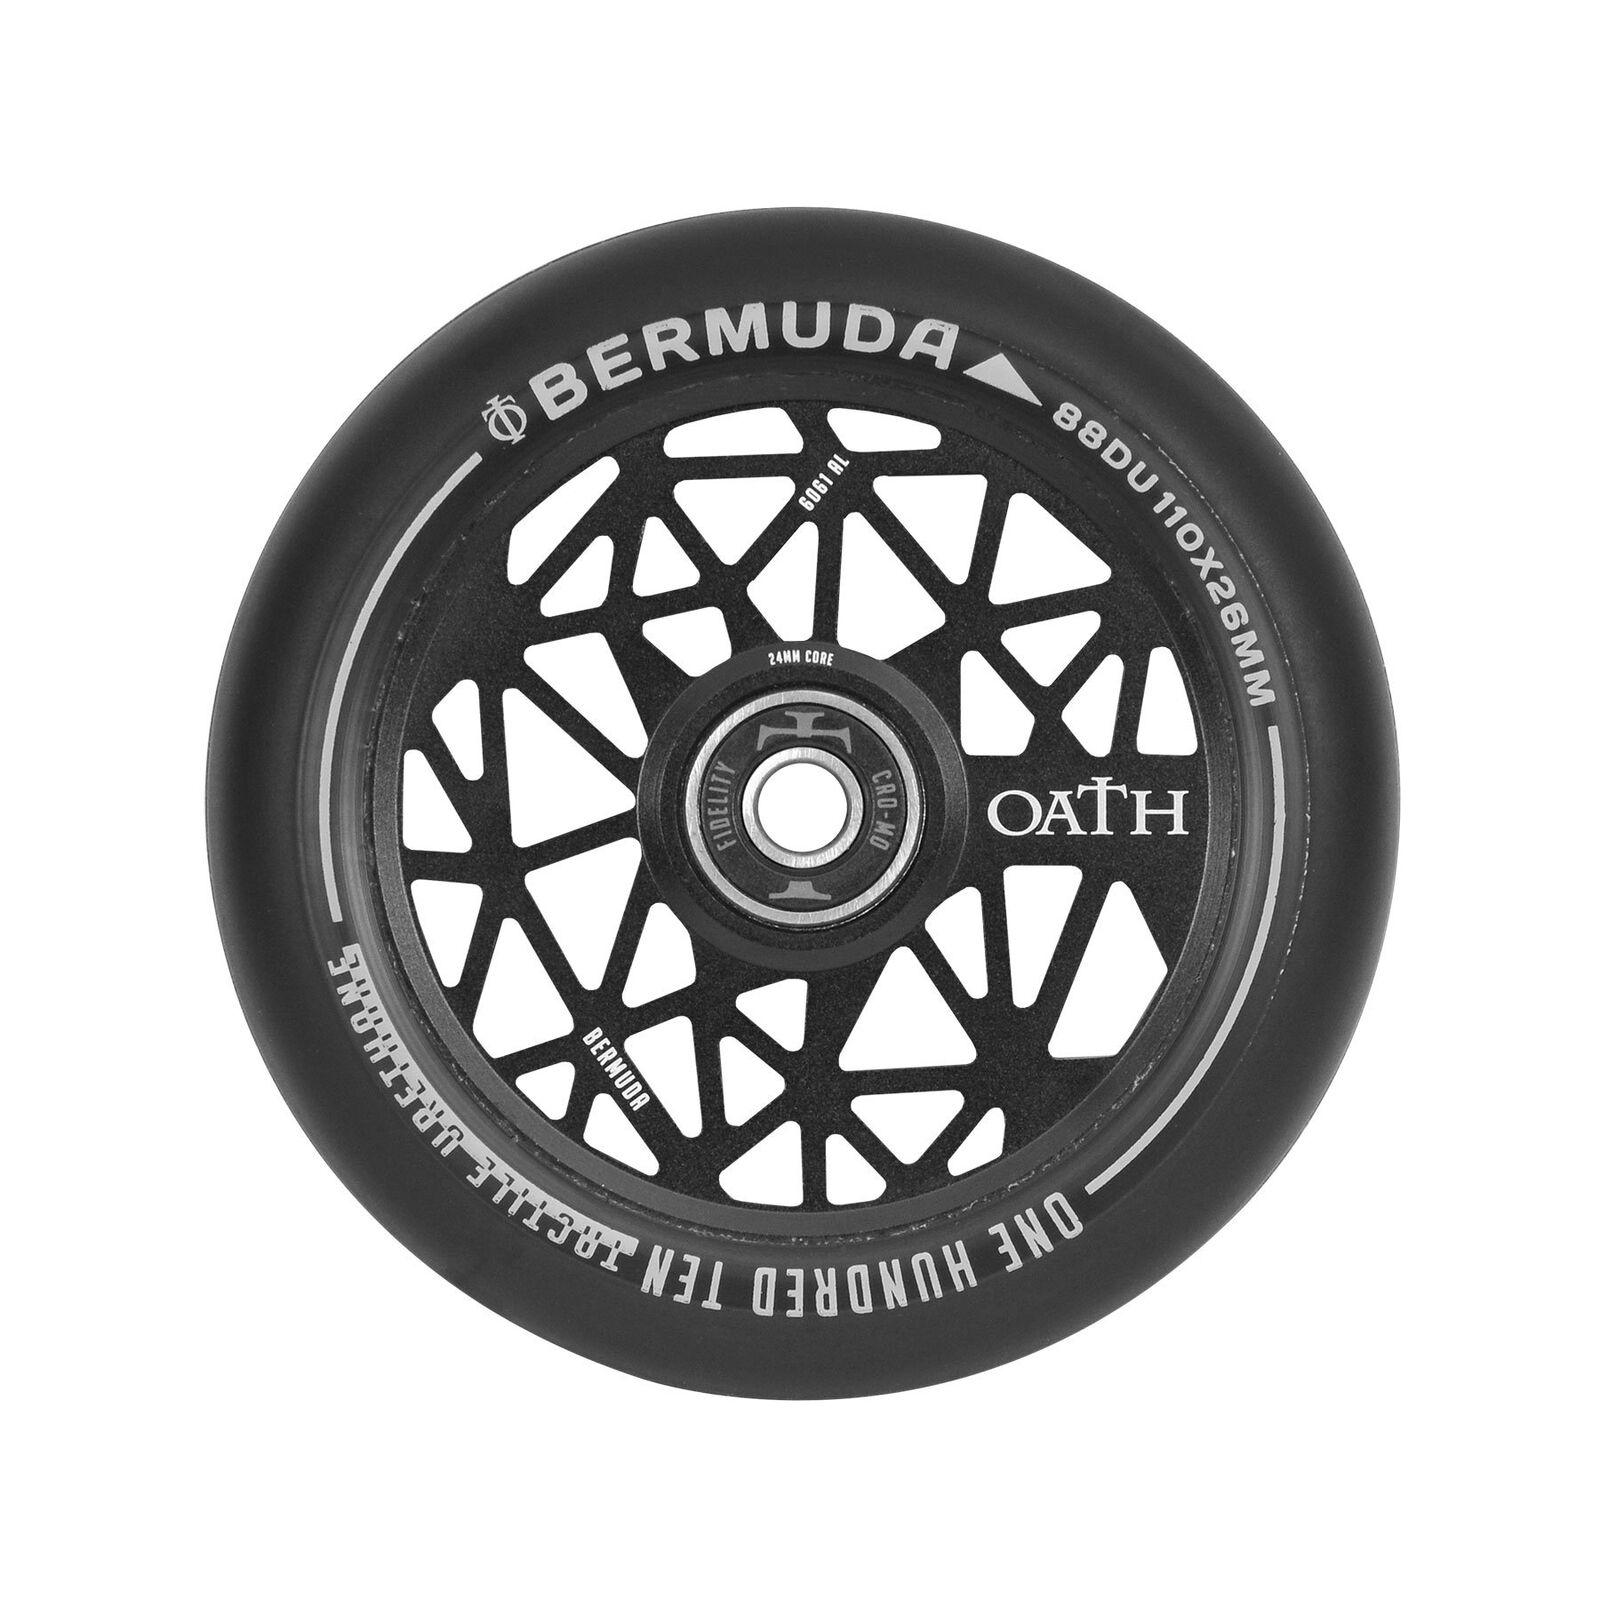 Oath Bermuda Rollerräder Rollerräder Rollerräder (Paar) 110mm - Satin Schwarz c7e537